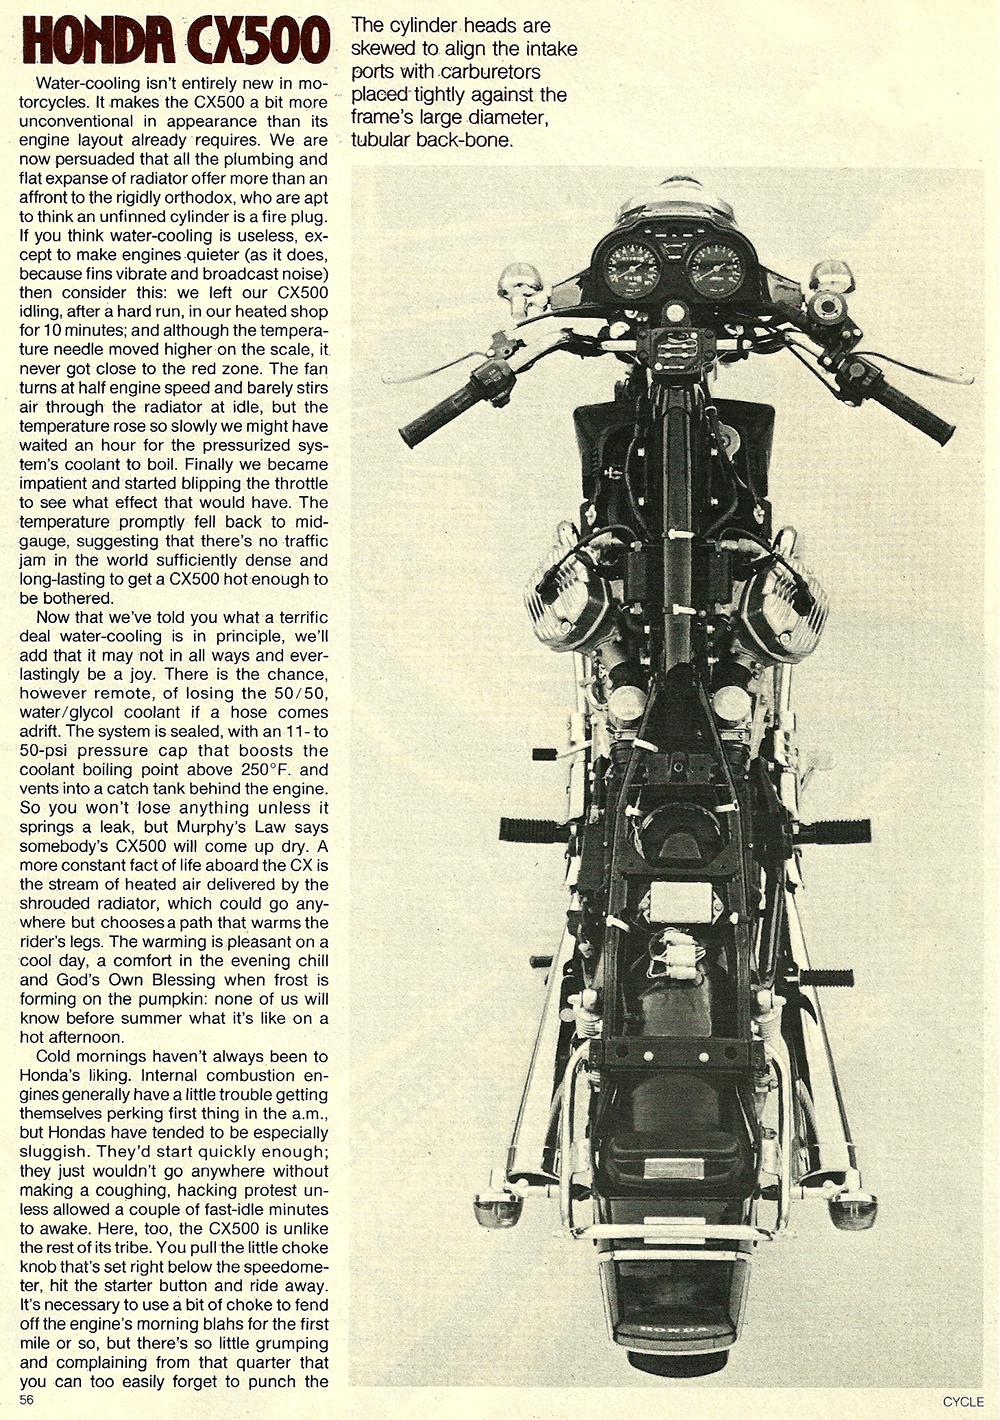 1978 Honda CX500 road test 03.jpg